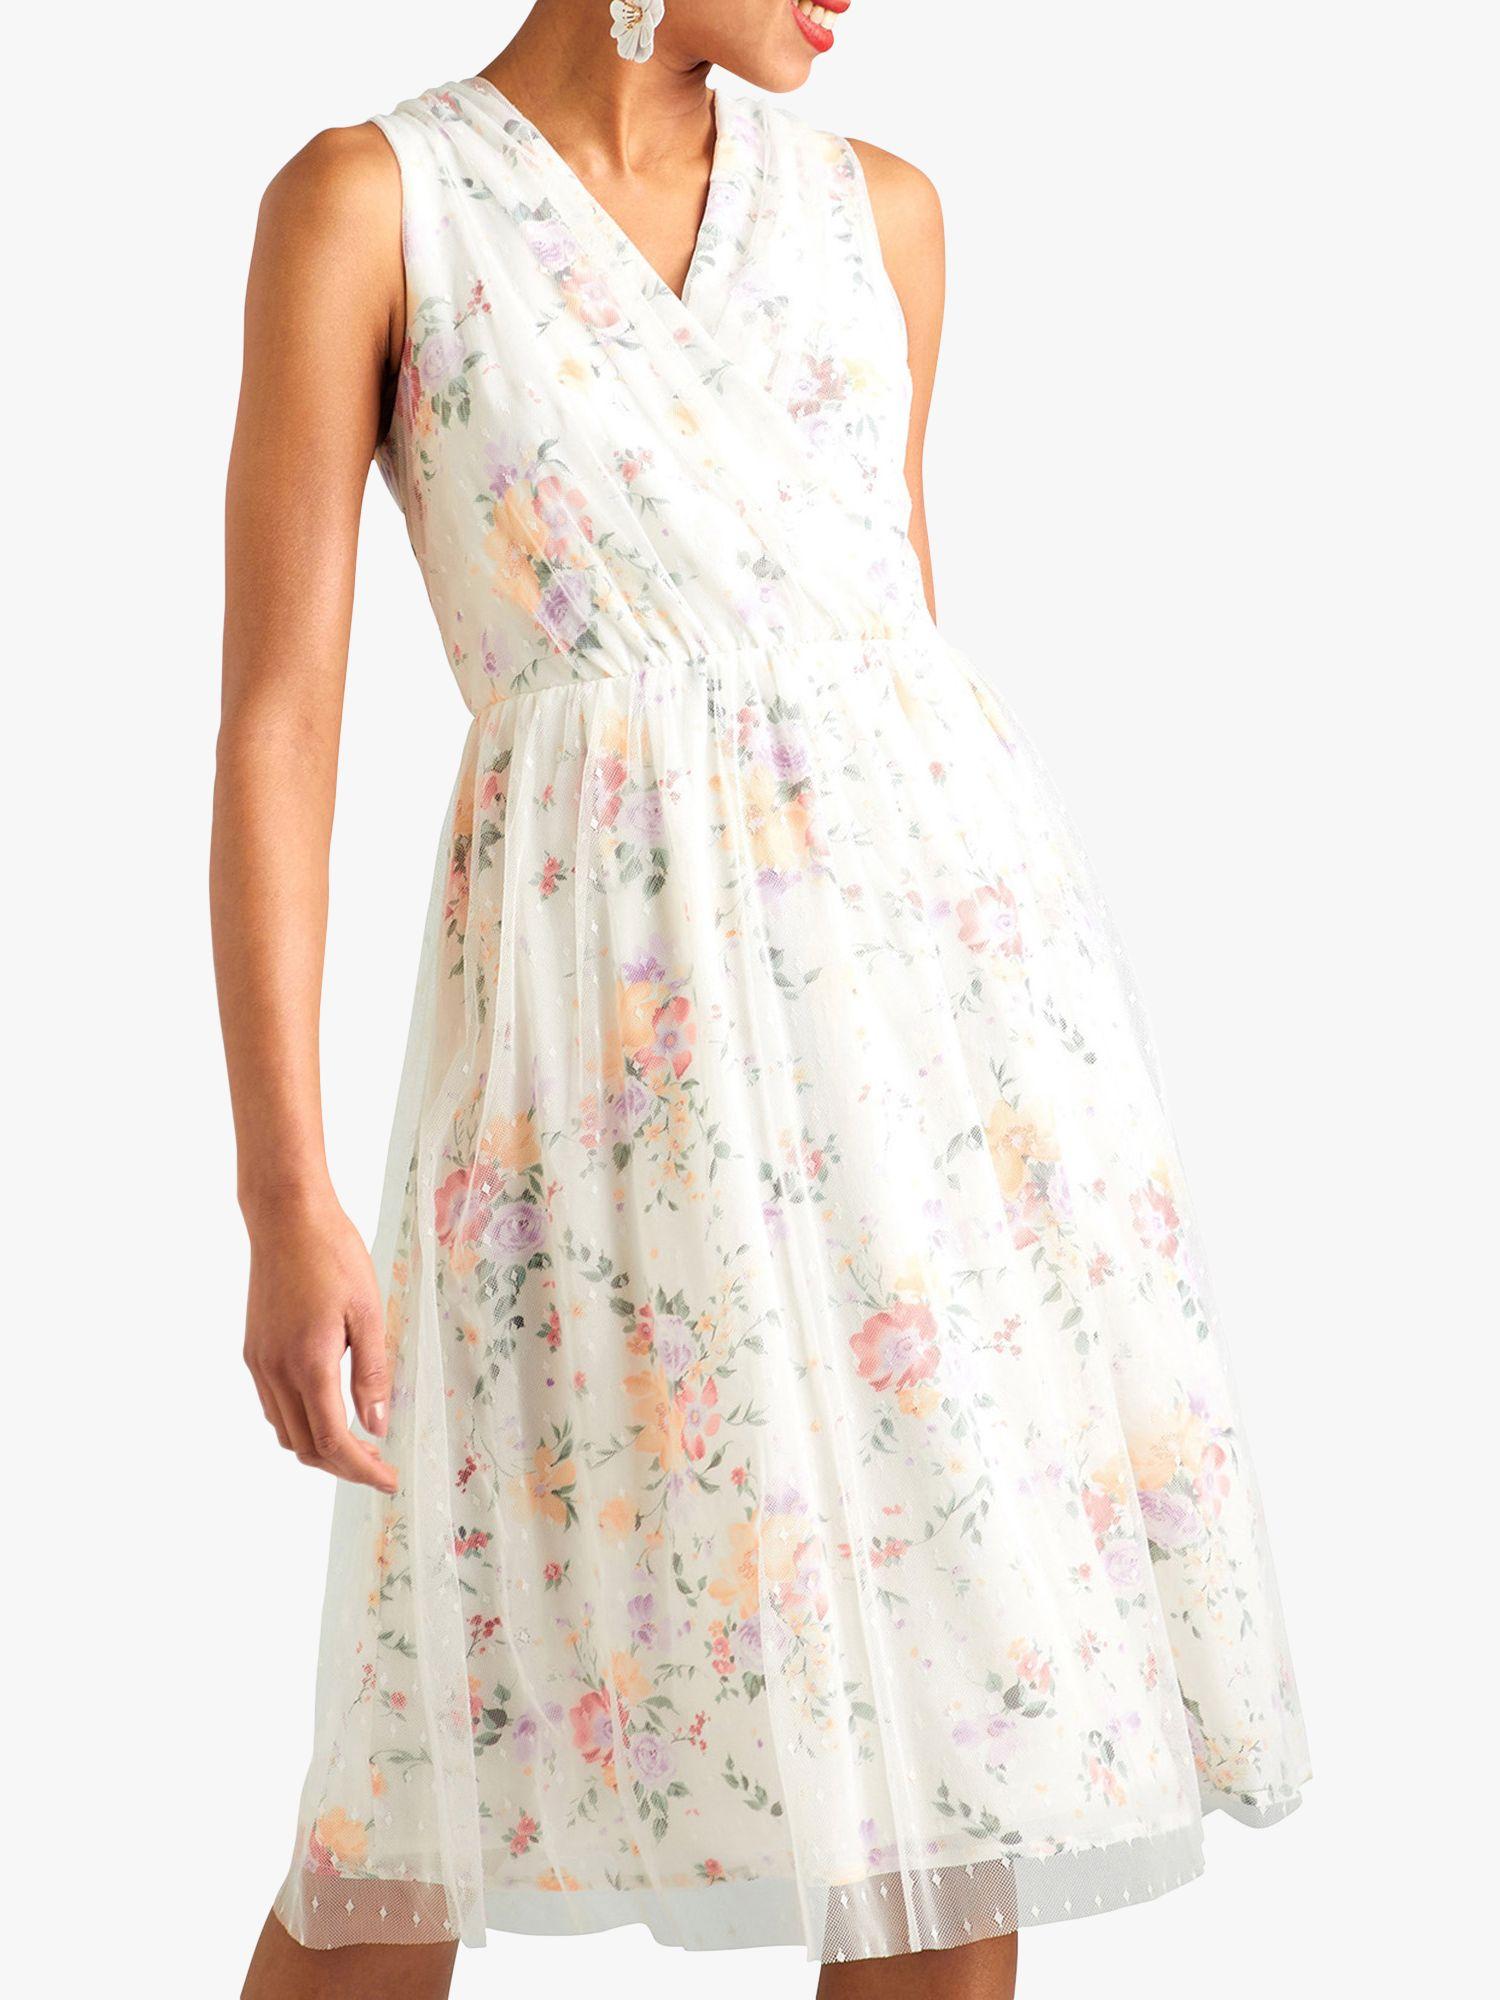 Yumi Yumi Garden Print Dress, White